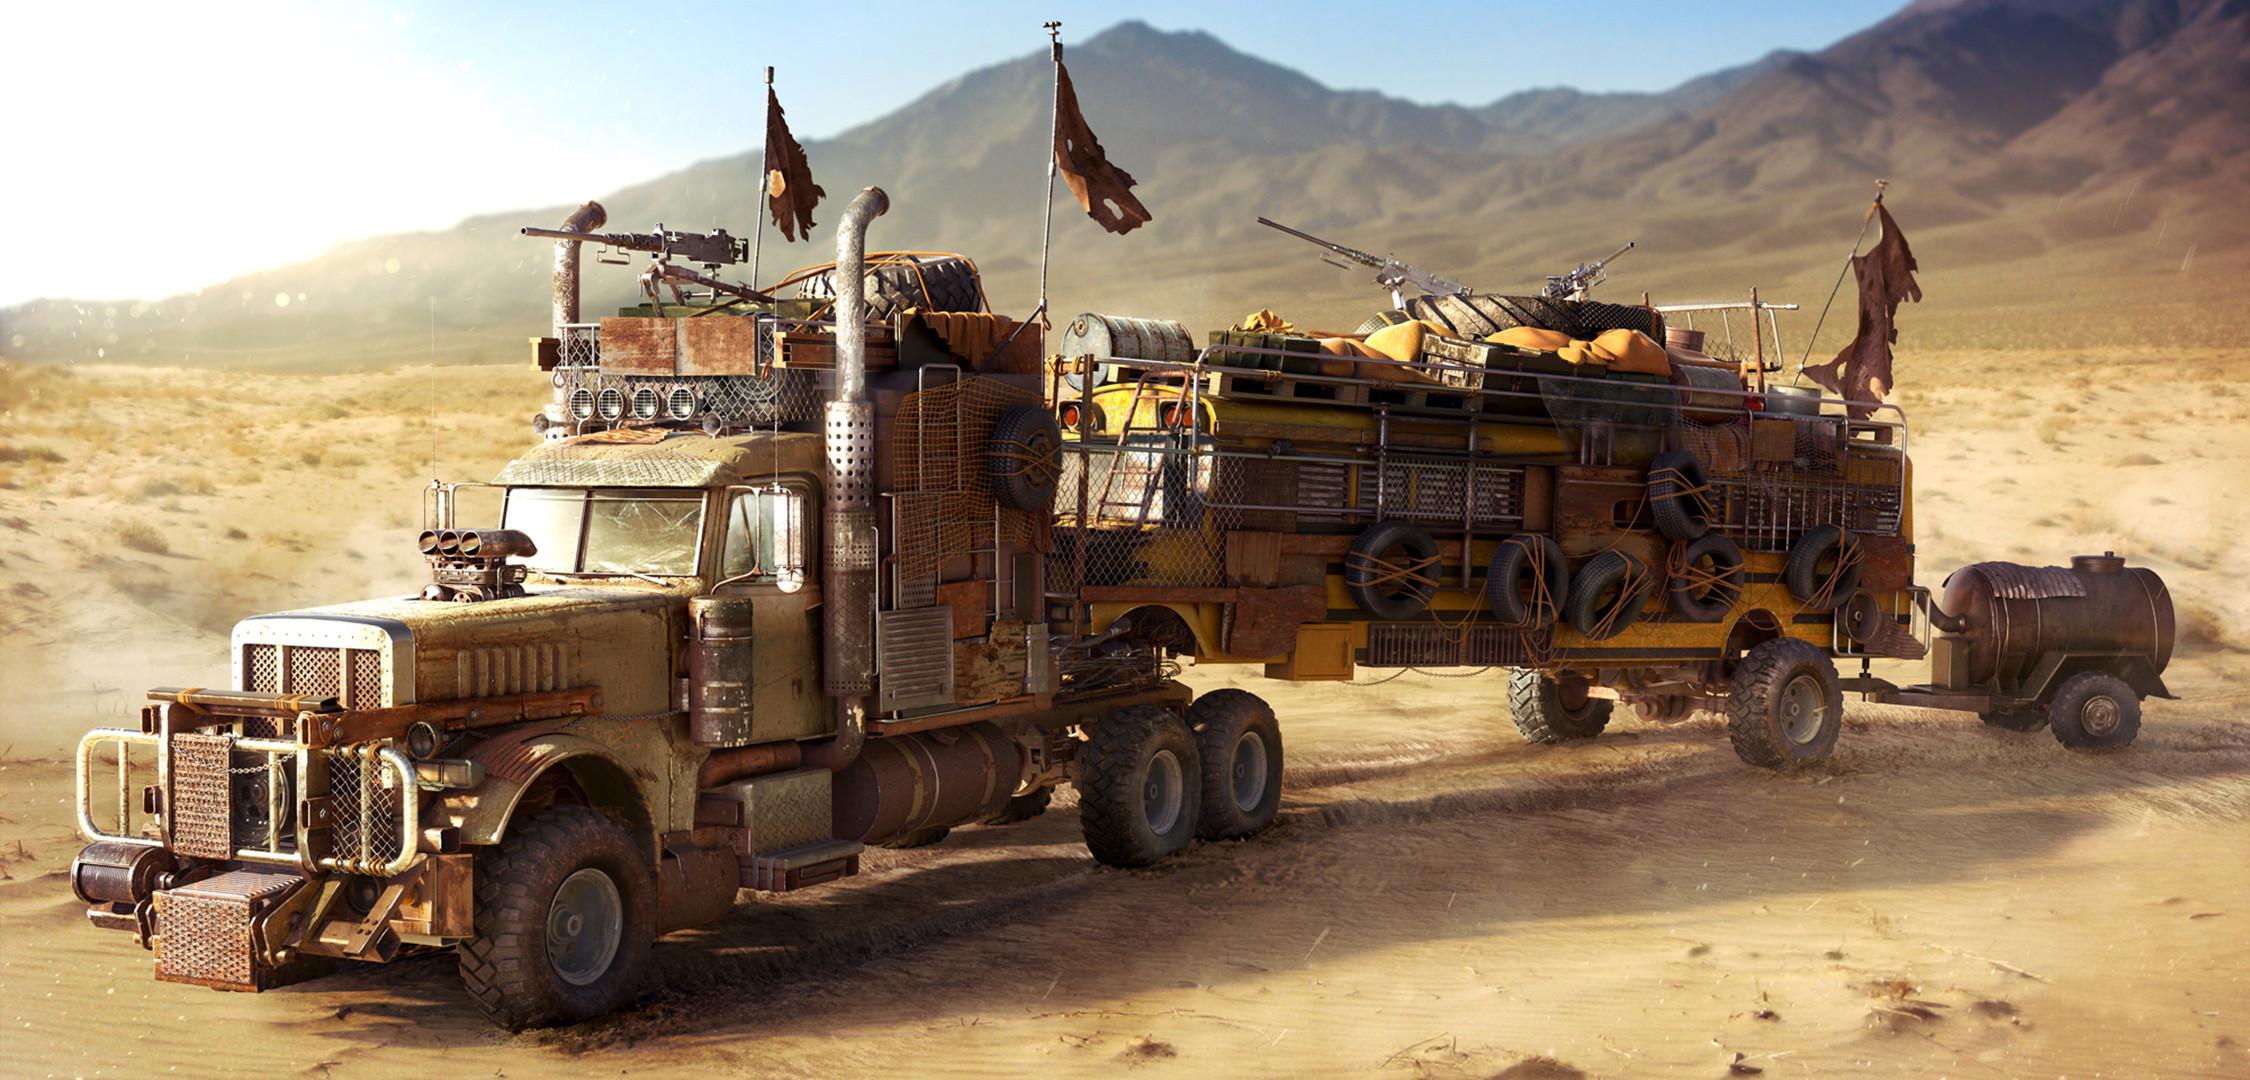 fallout, school bus, truck, wasteland, desert, postapocalyptic, desert, bus